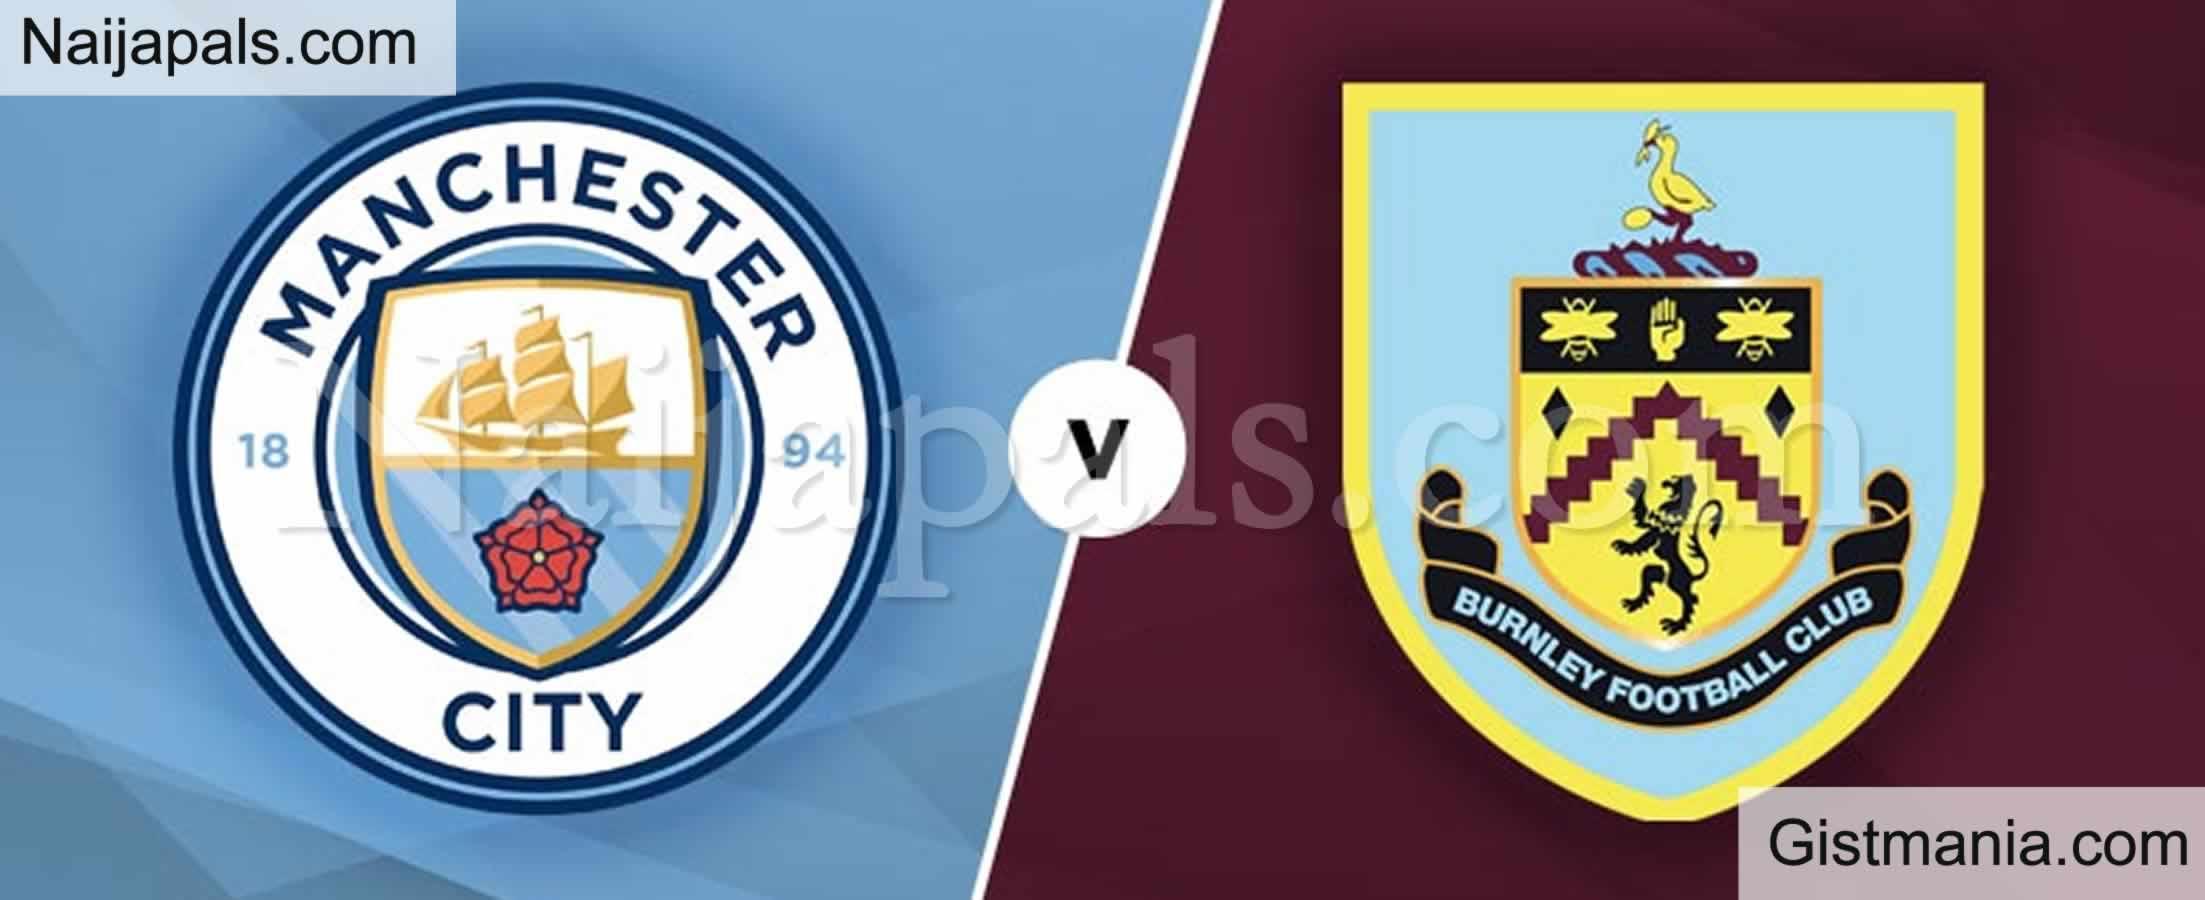 <img alt='.' class='lazyload' data-src='https://img.gistmania.com/emot/soccer.gif' /> <b>Manchester City v Burnley : English Premier League Match, Team News, Goal Scorers and Stats</b>